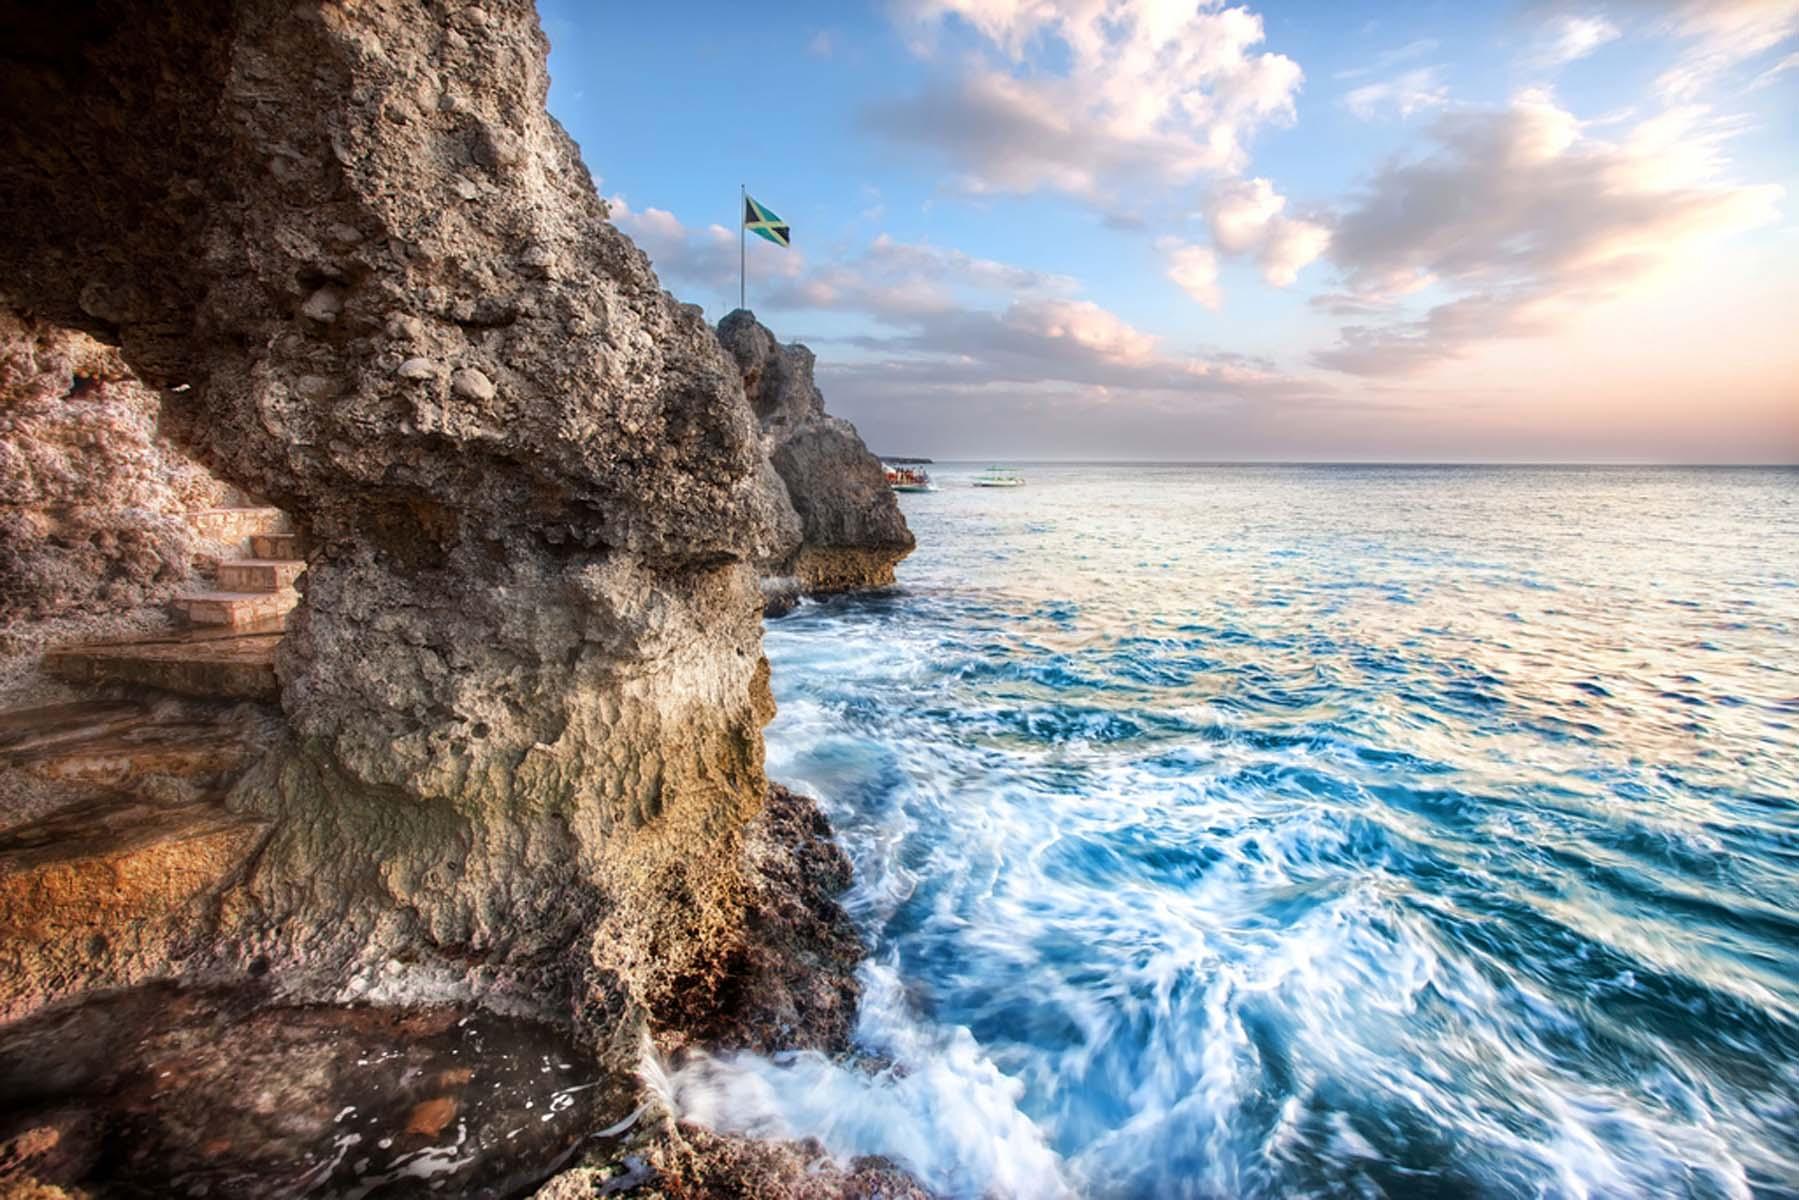 Acantilados-Negril-Jamaica